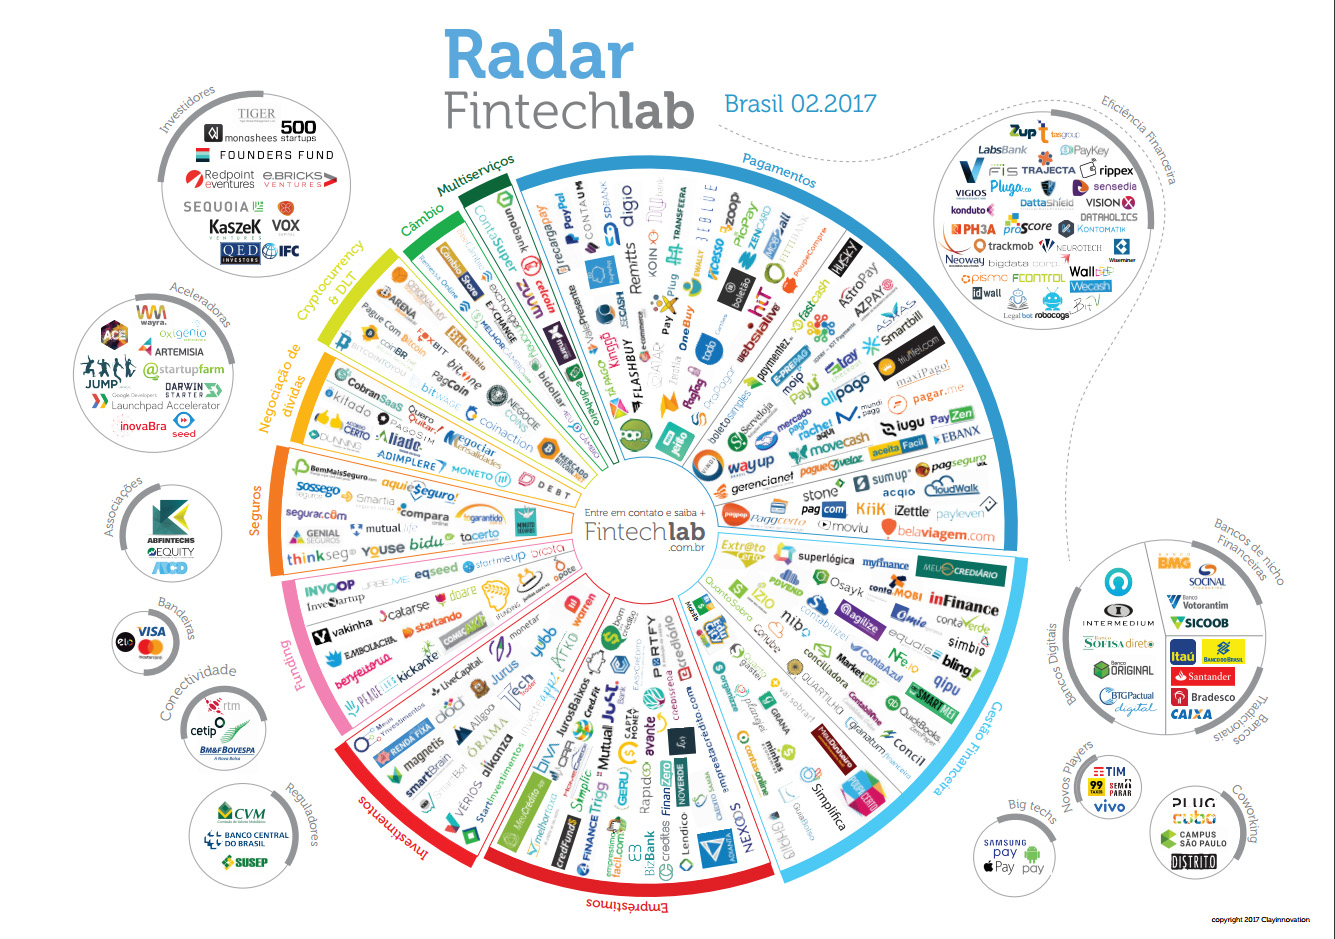 Radar Fintechlab 2017